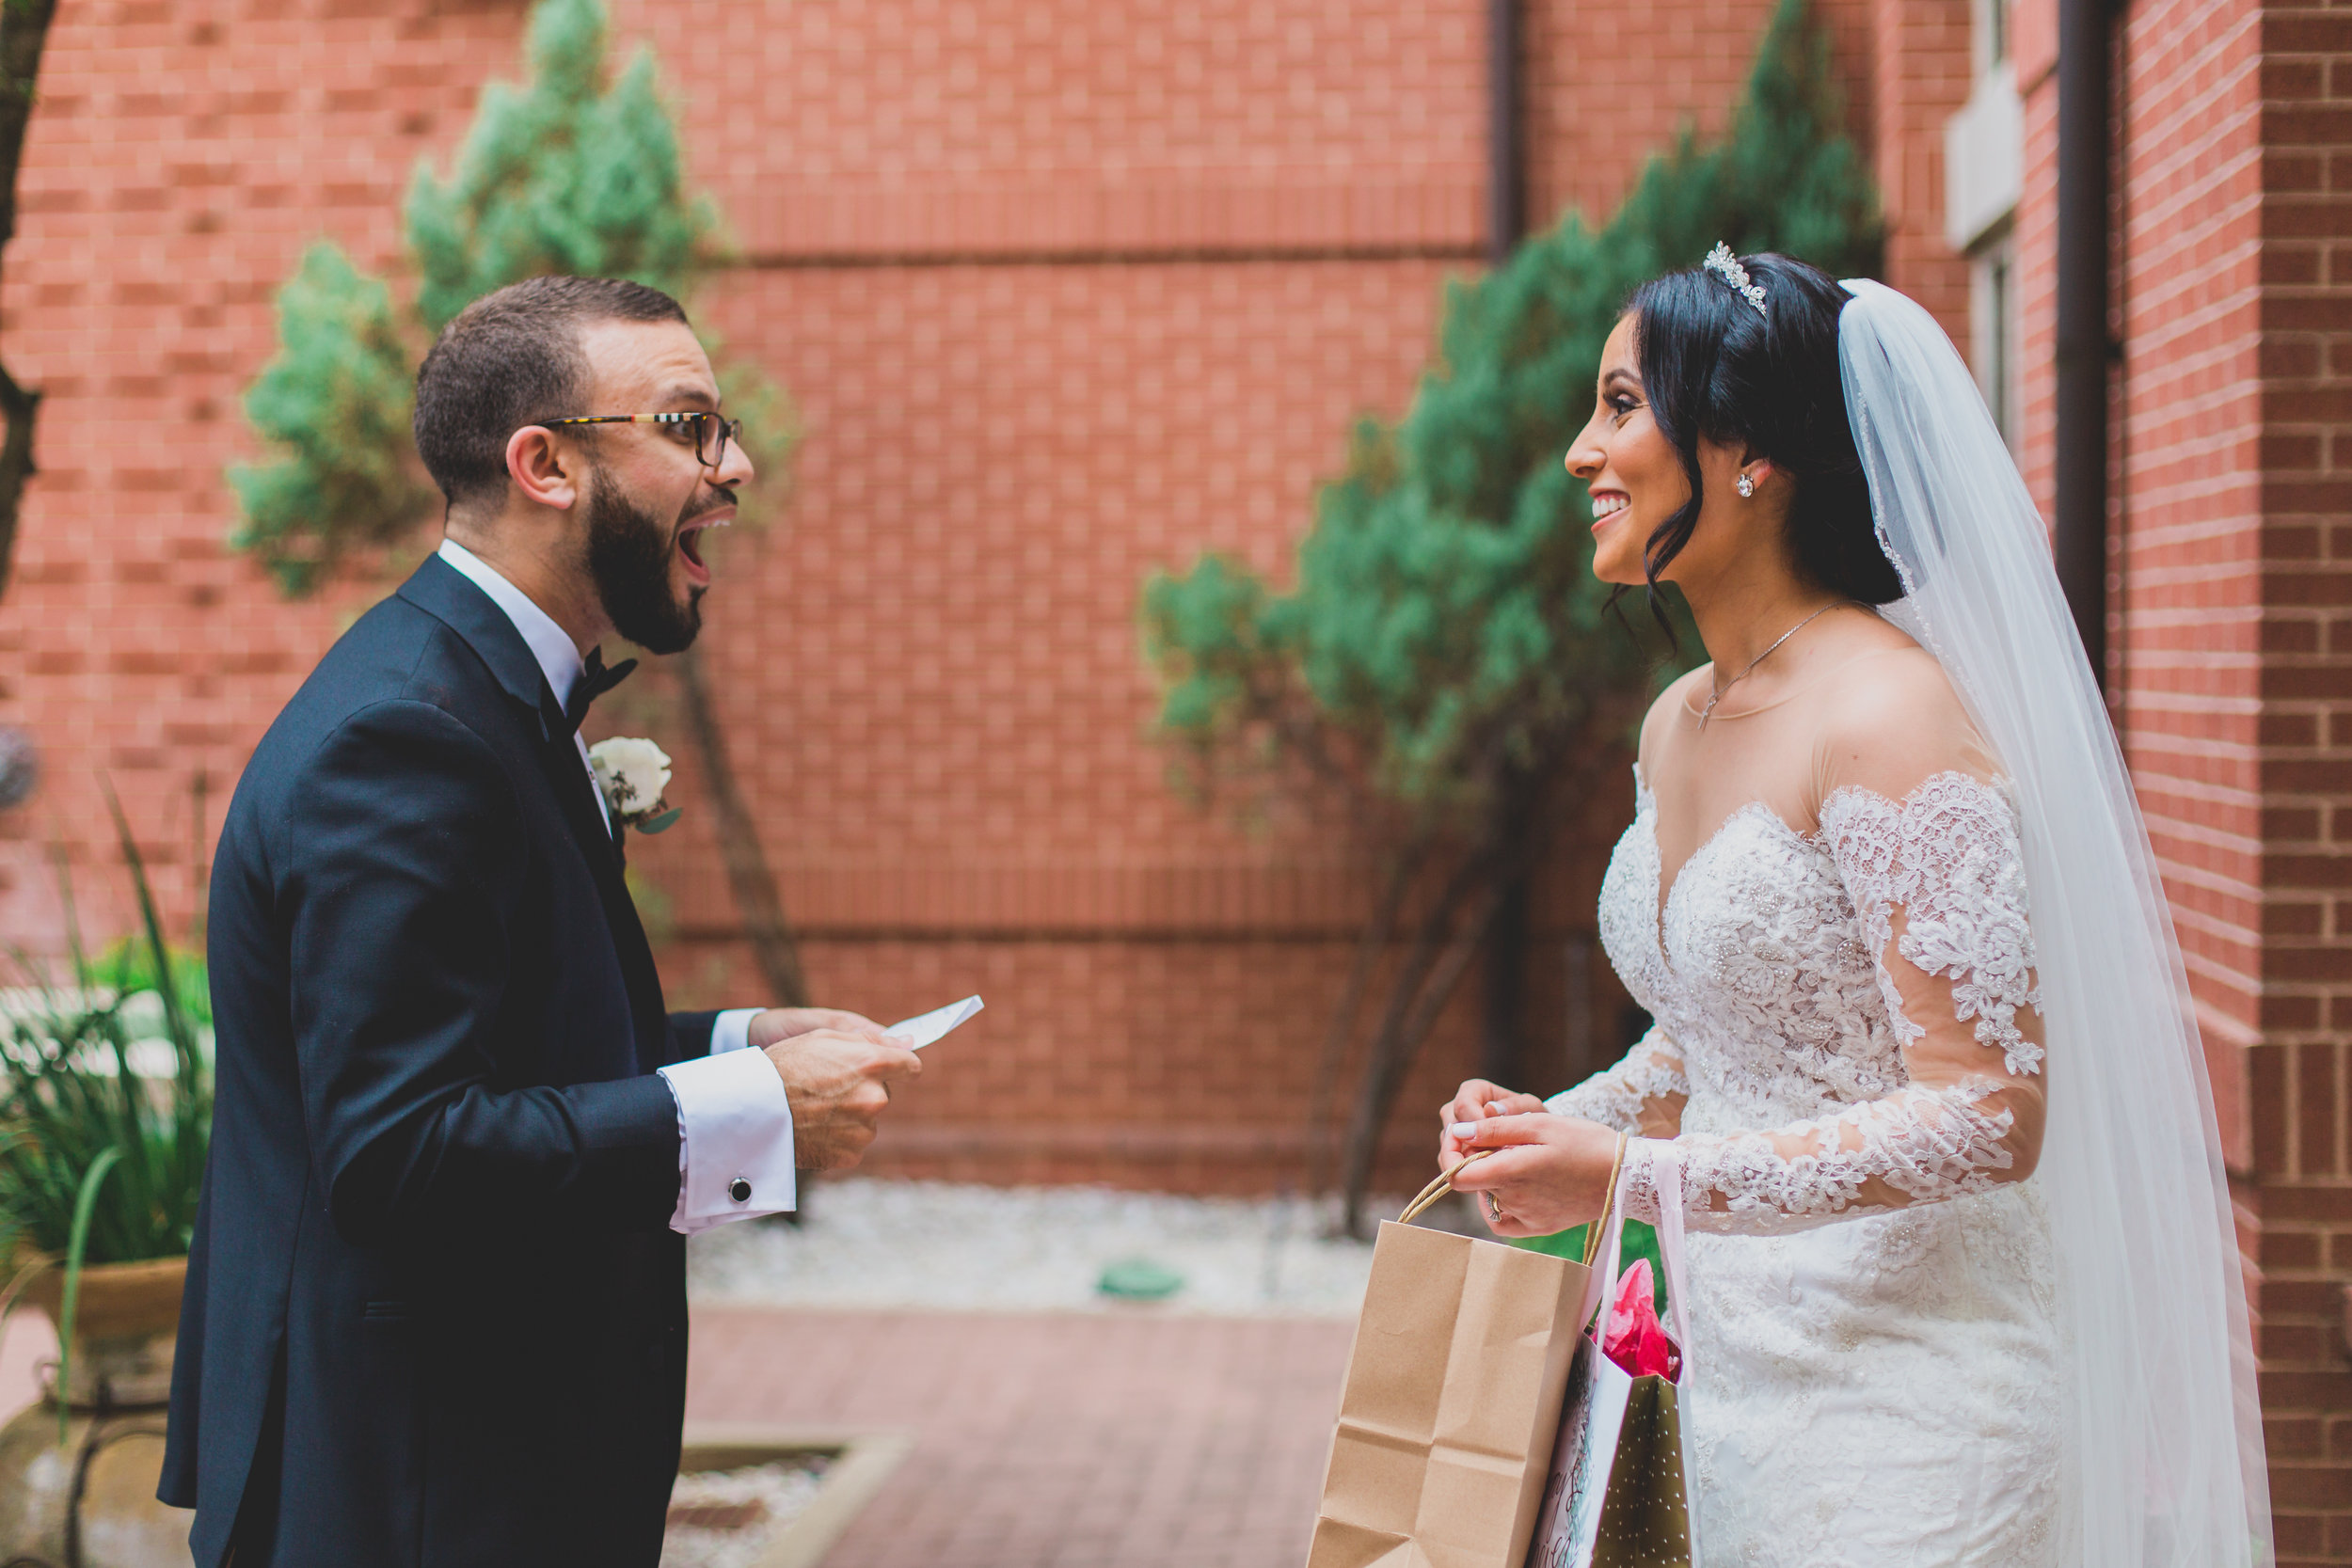 sugar-land-tx-wedding-photography-marriott-gift-exchange-2